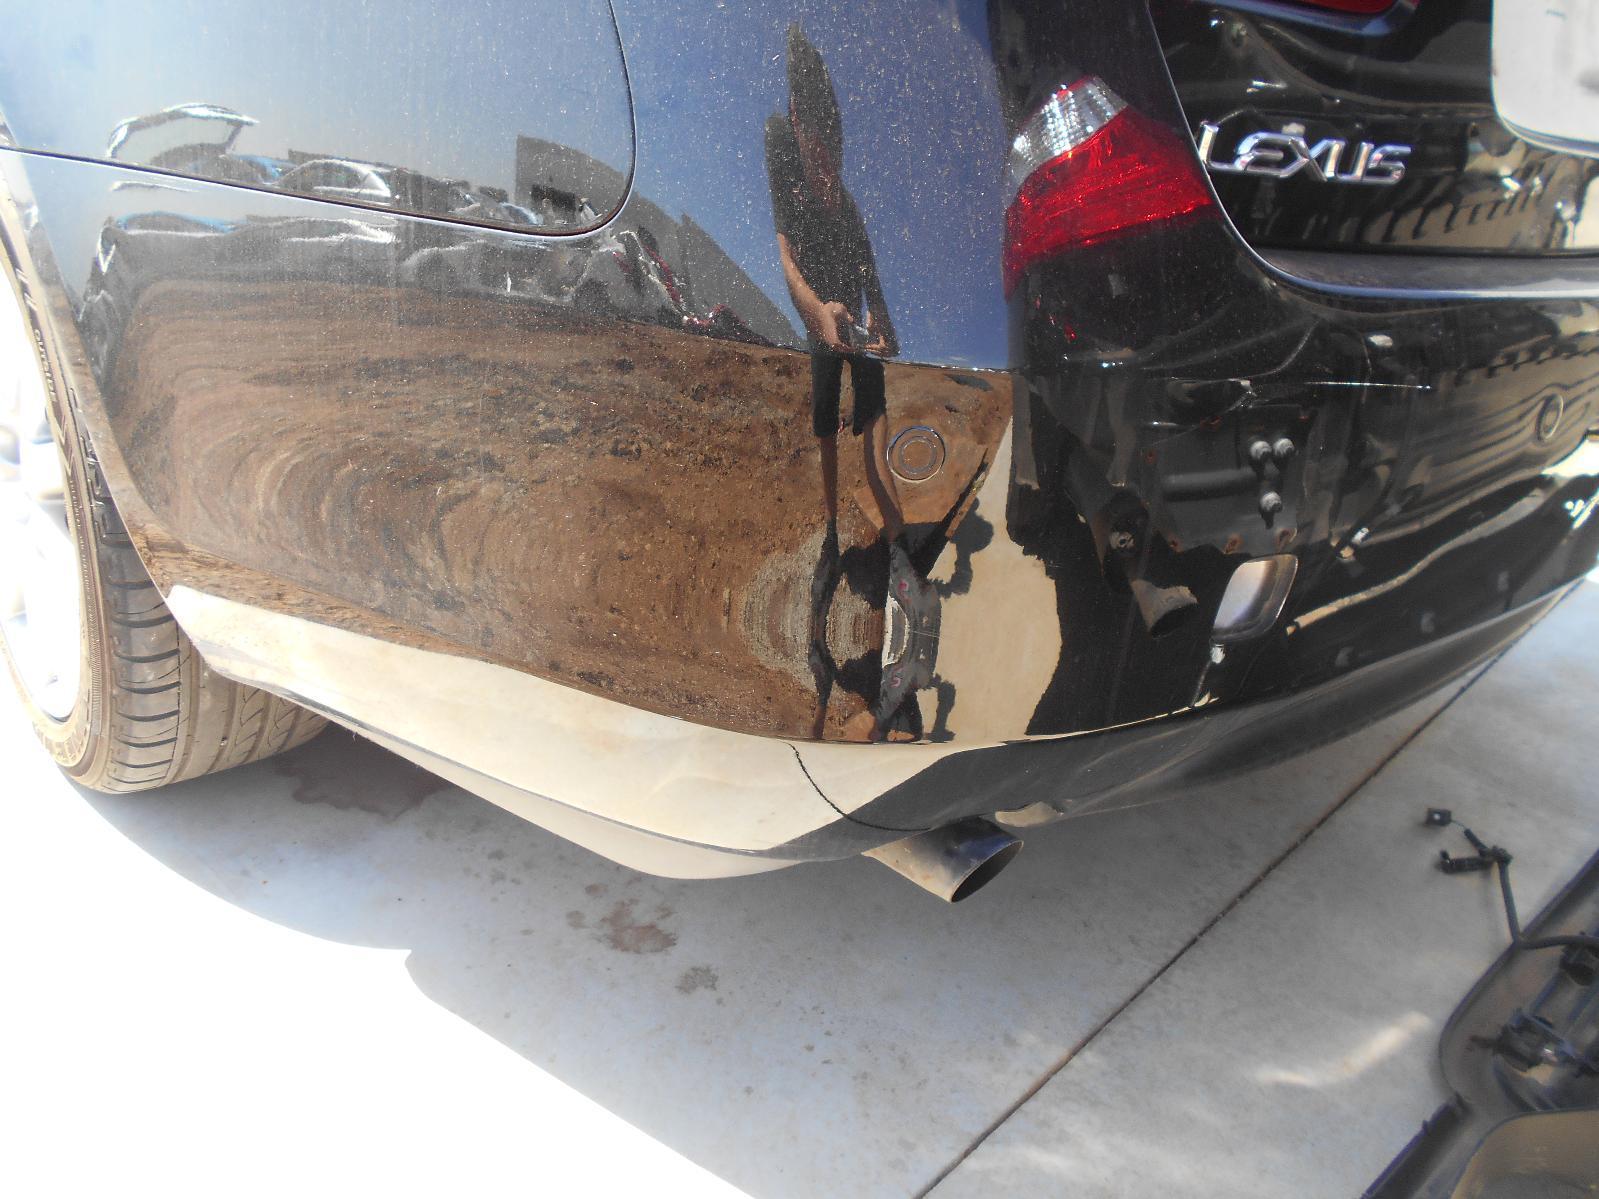 LEXUS GS, Rear Bumper, 190 SERIES, 03/05-01/08